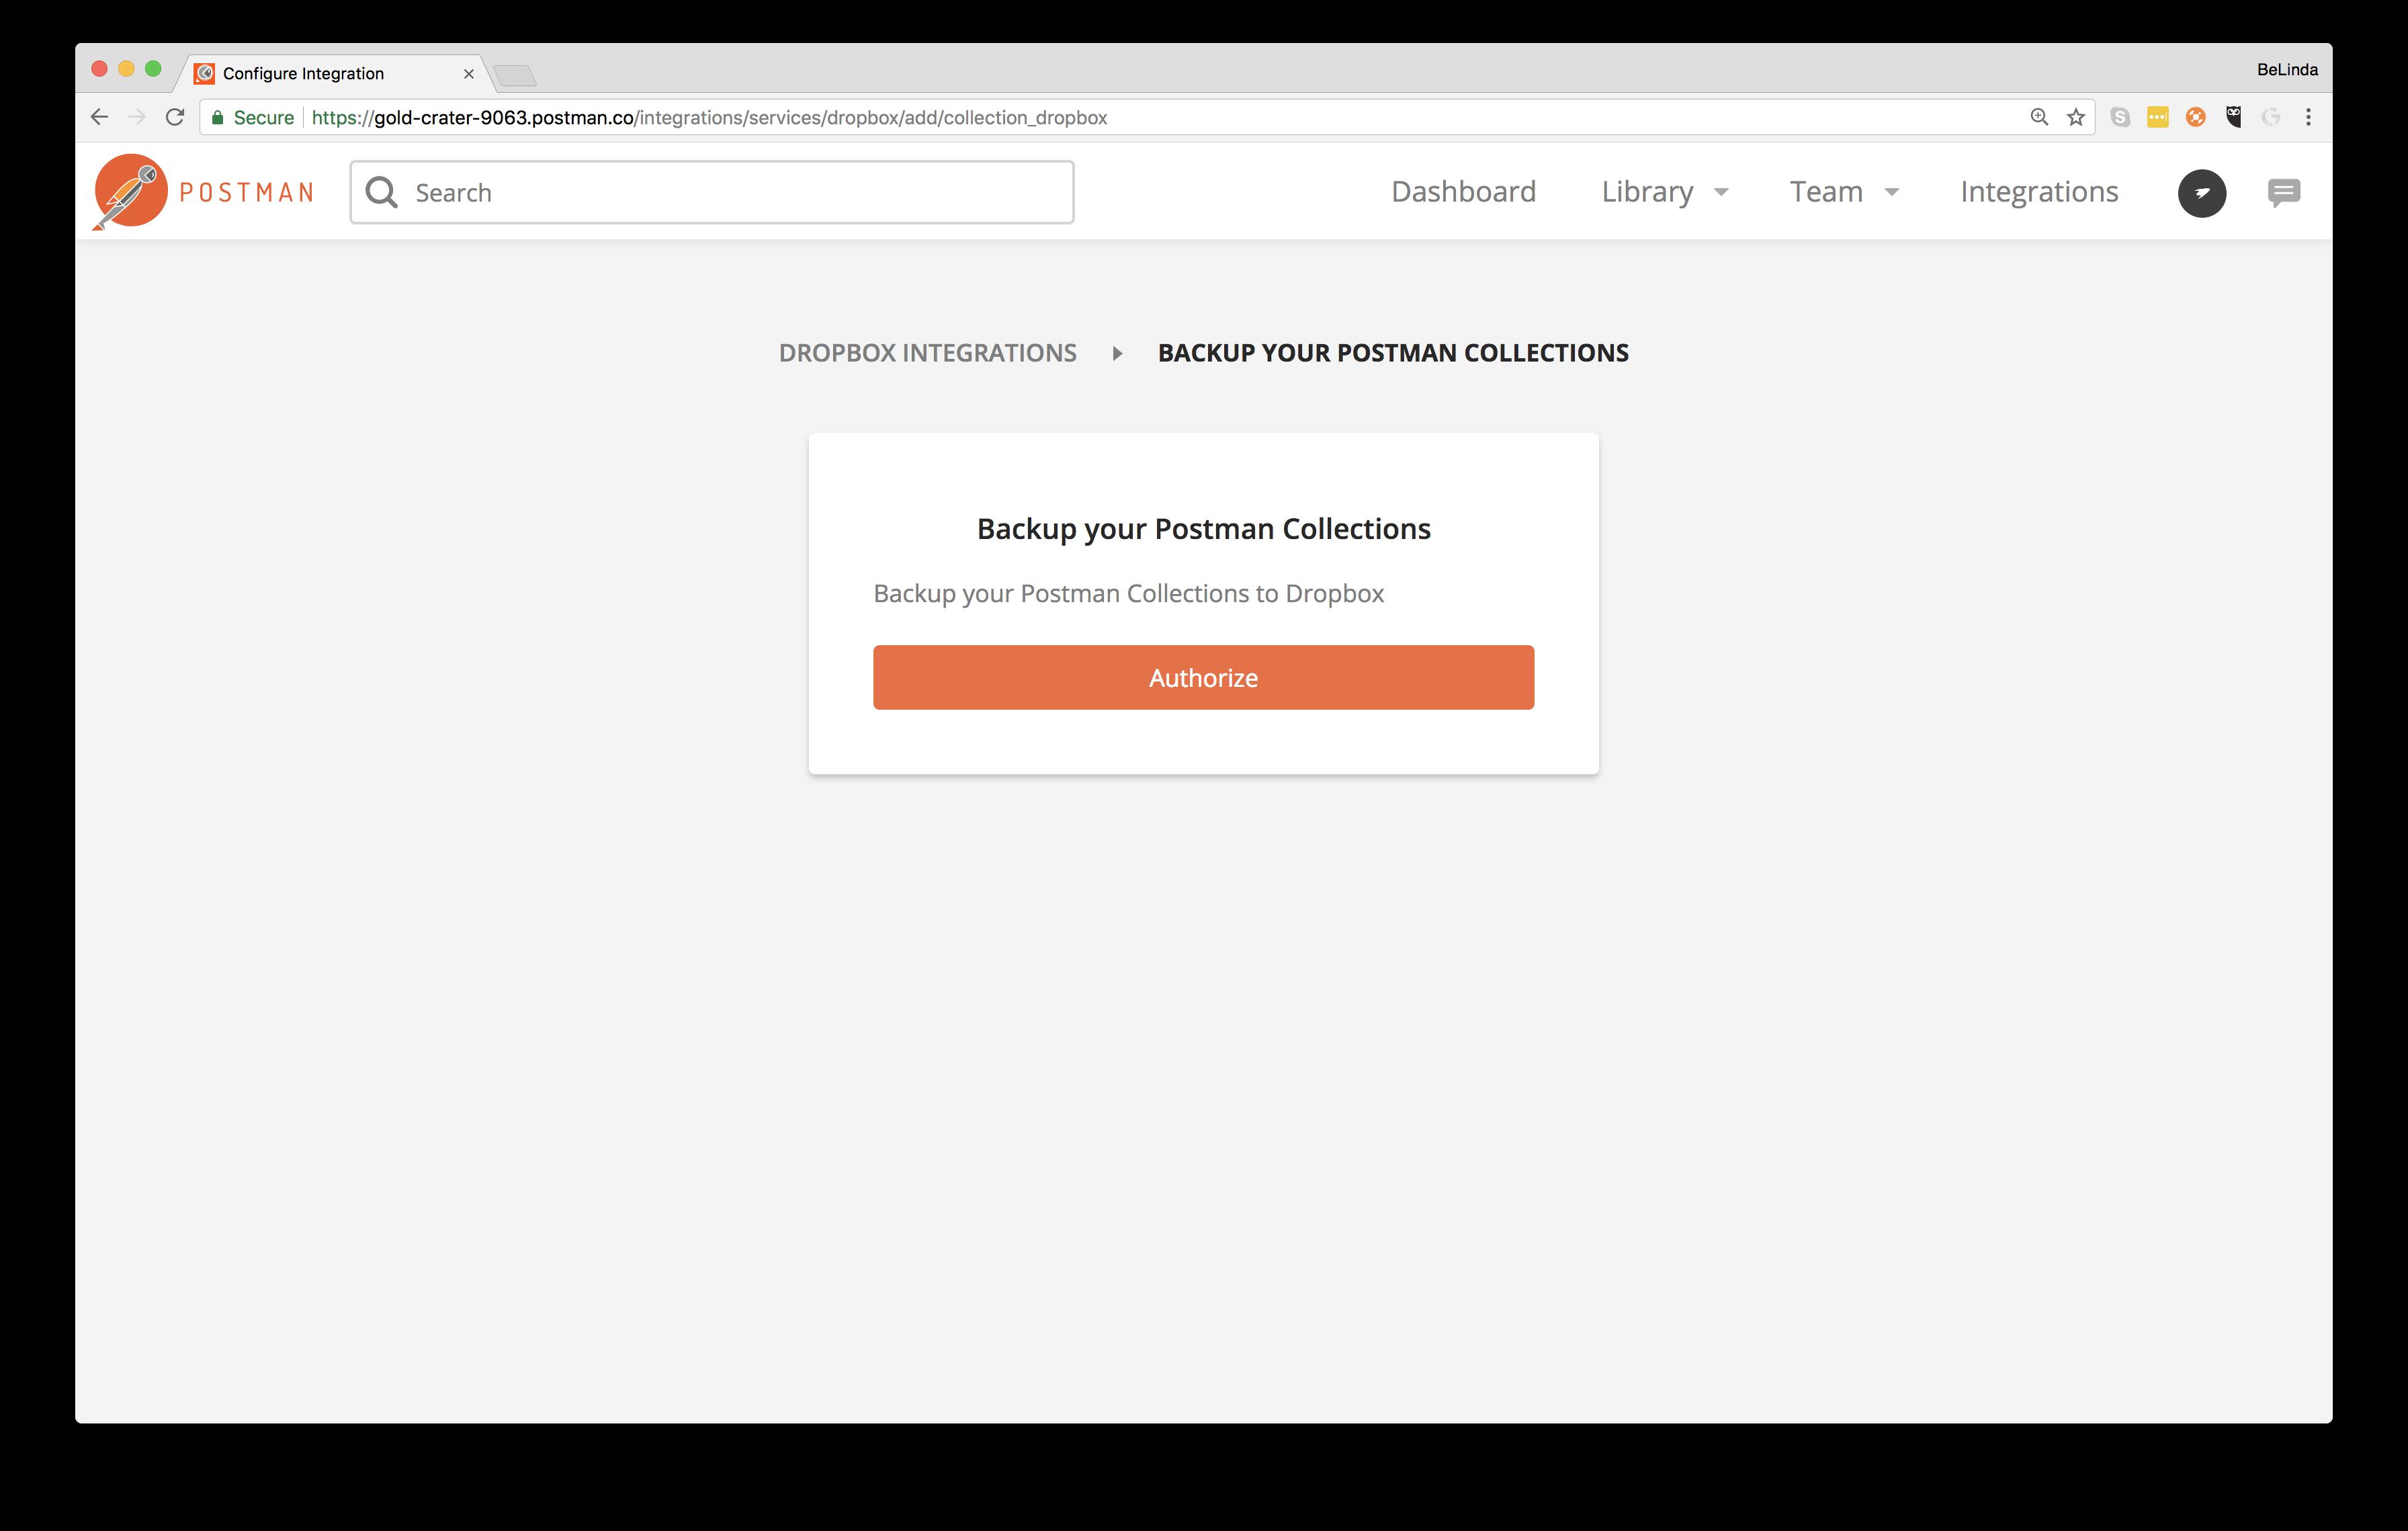 select dropbox integration